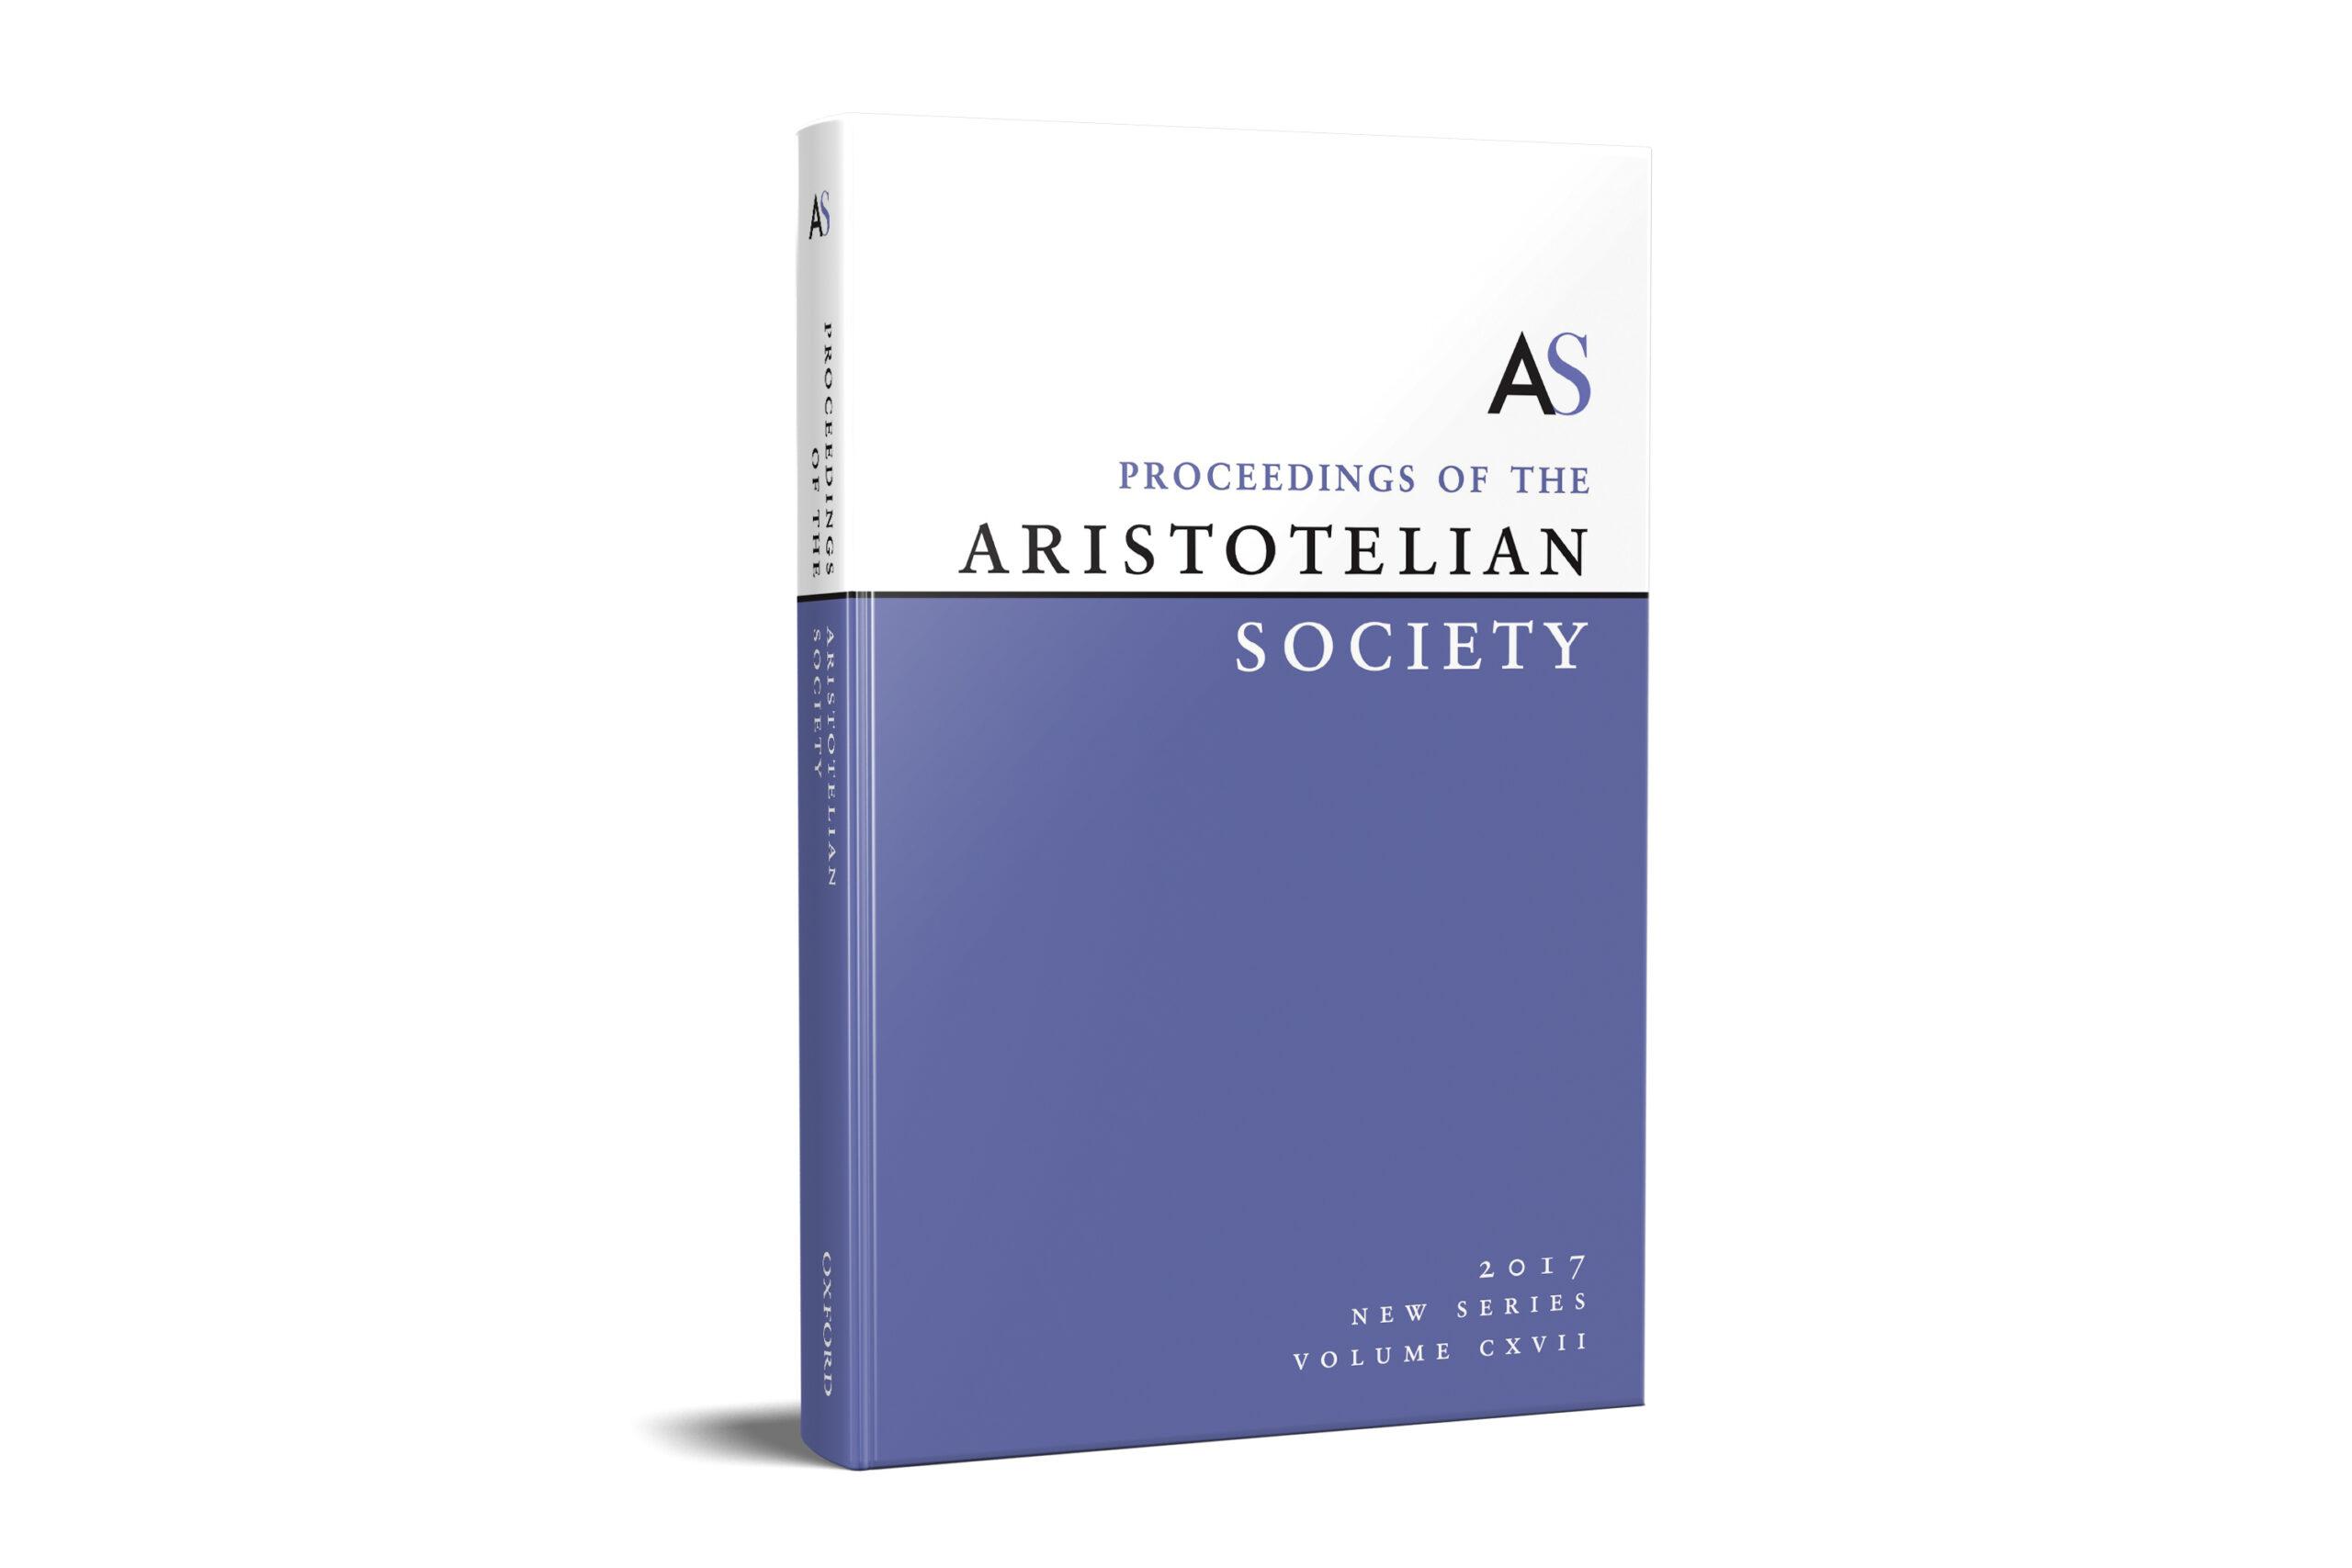 The Proceedings of the Aristotelian Society